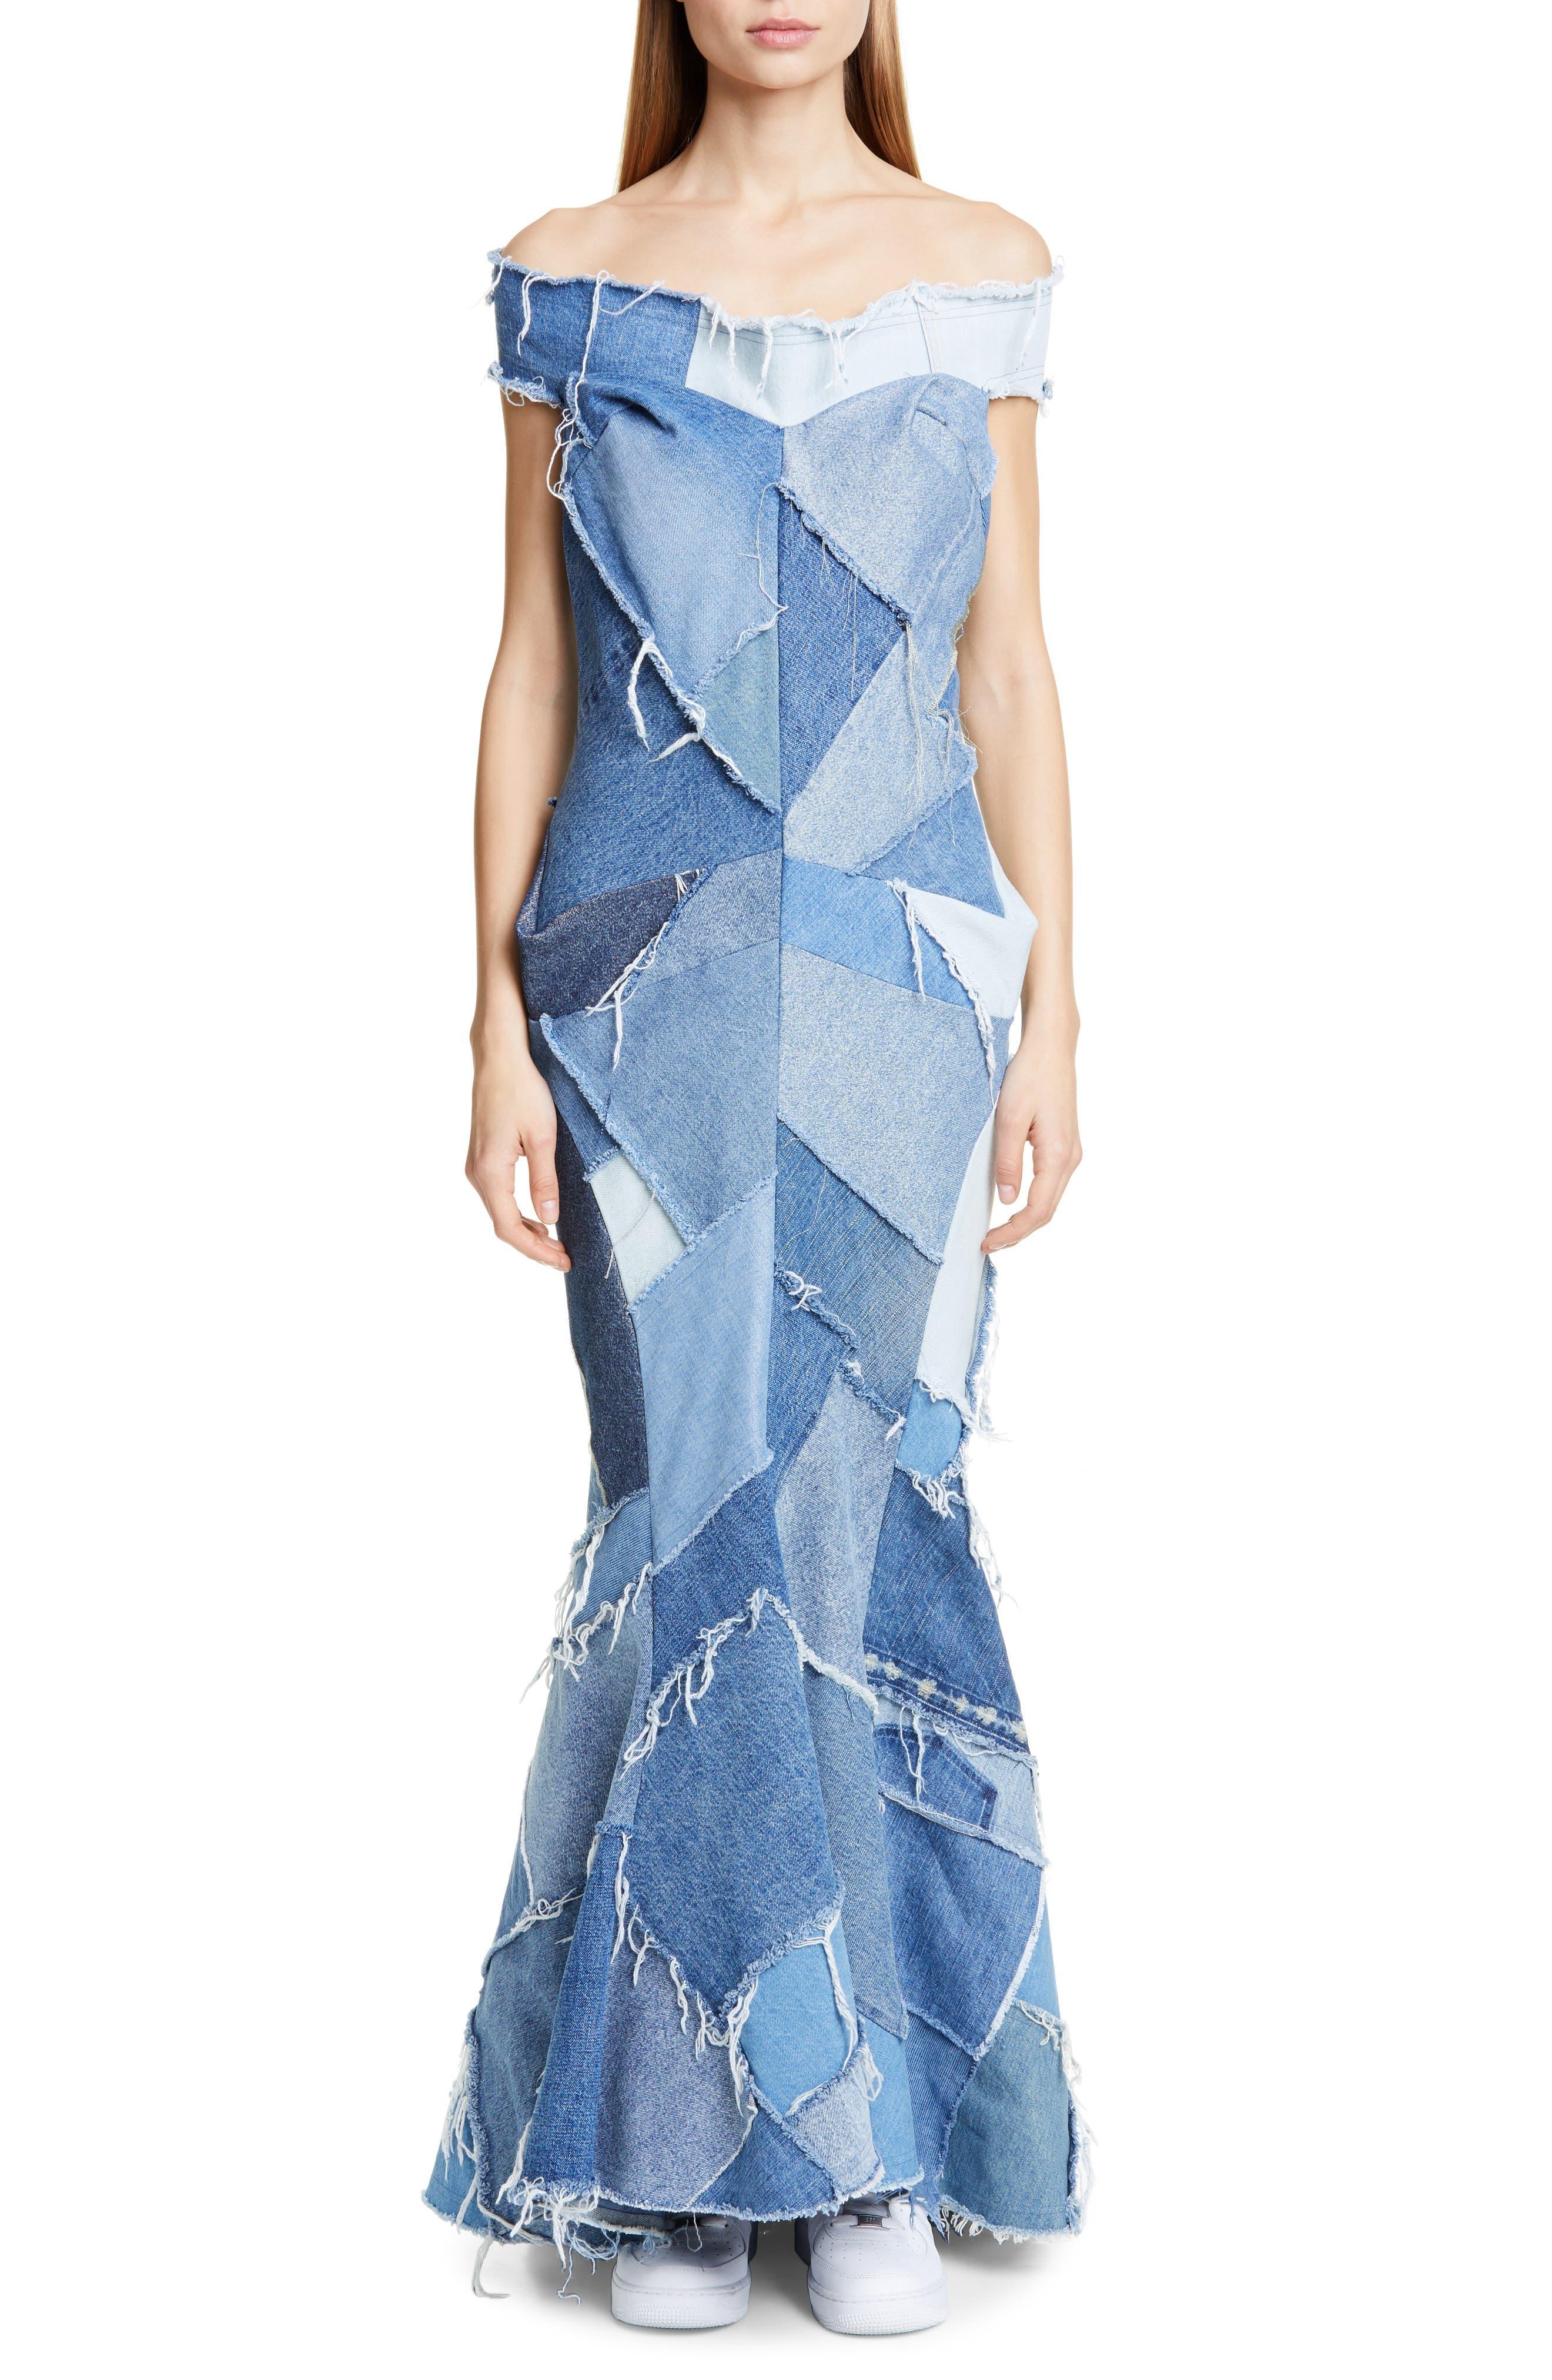 JUNYA WATANABE, Denim Patchwork Off the Shoulder Mermaid Dress, Main thumbnail 1, color, INDIGO